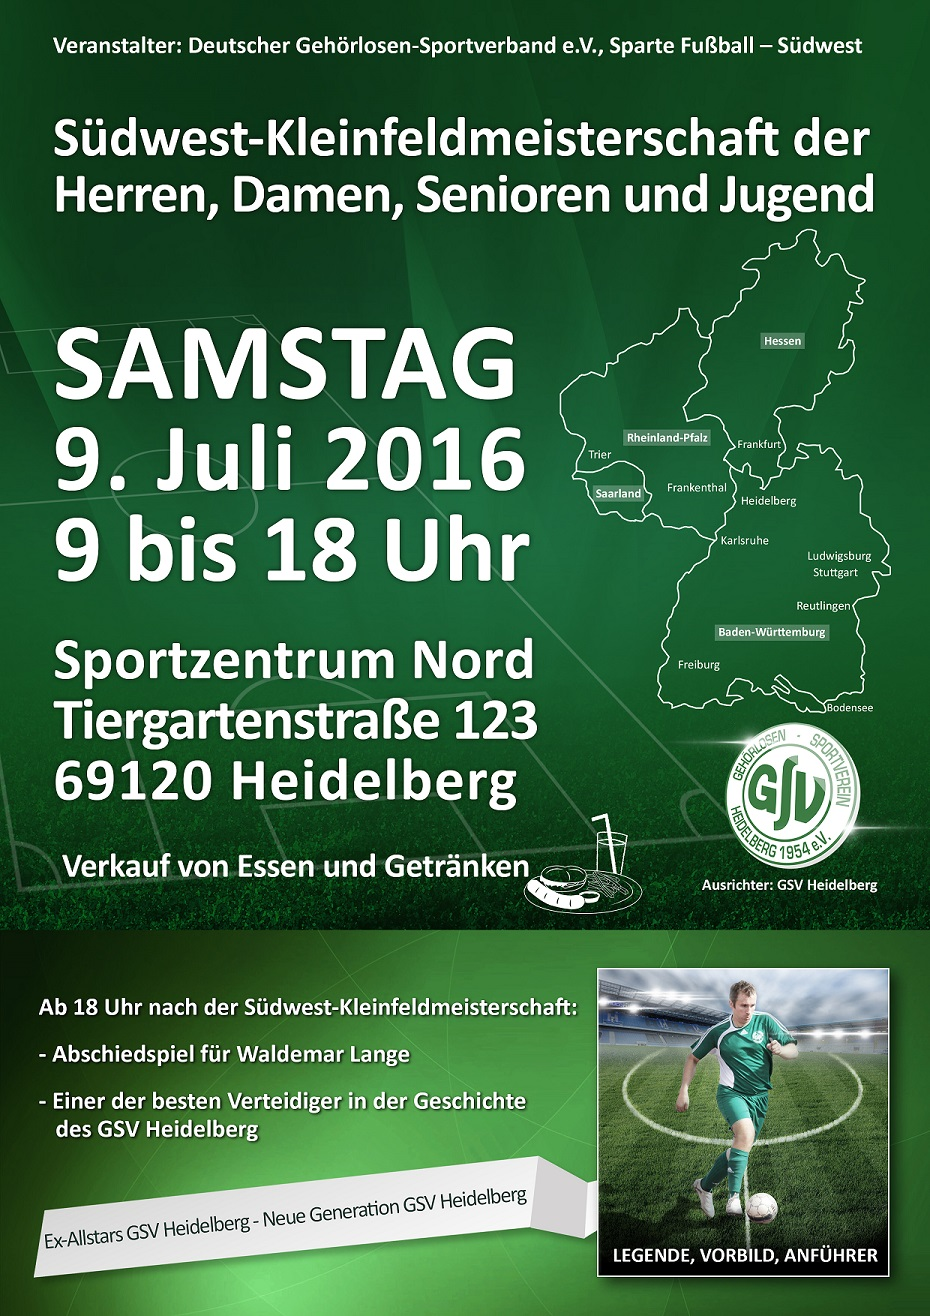 Plakat-Südwest Kleinfeldmeisterschaft 09.07.2016 in Heidelberg